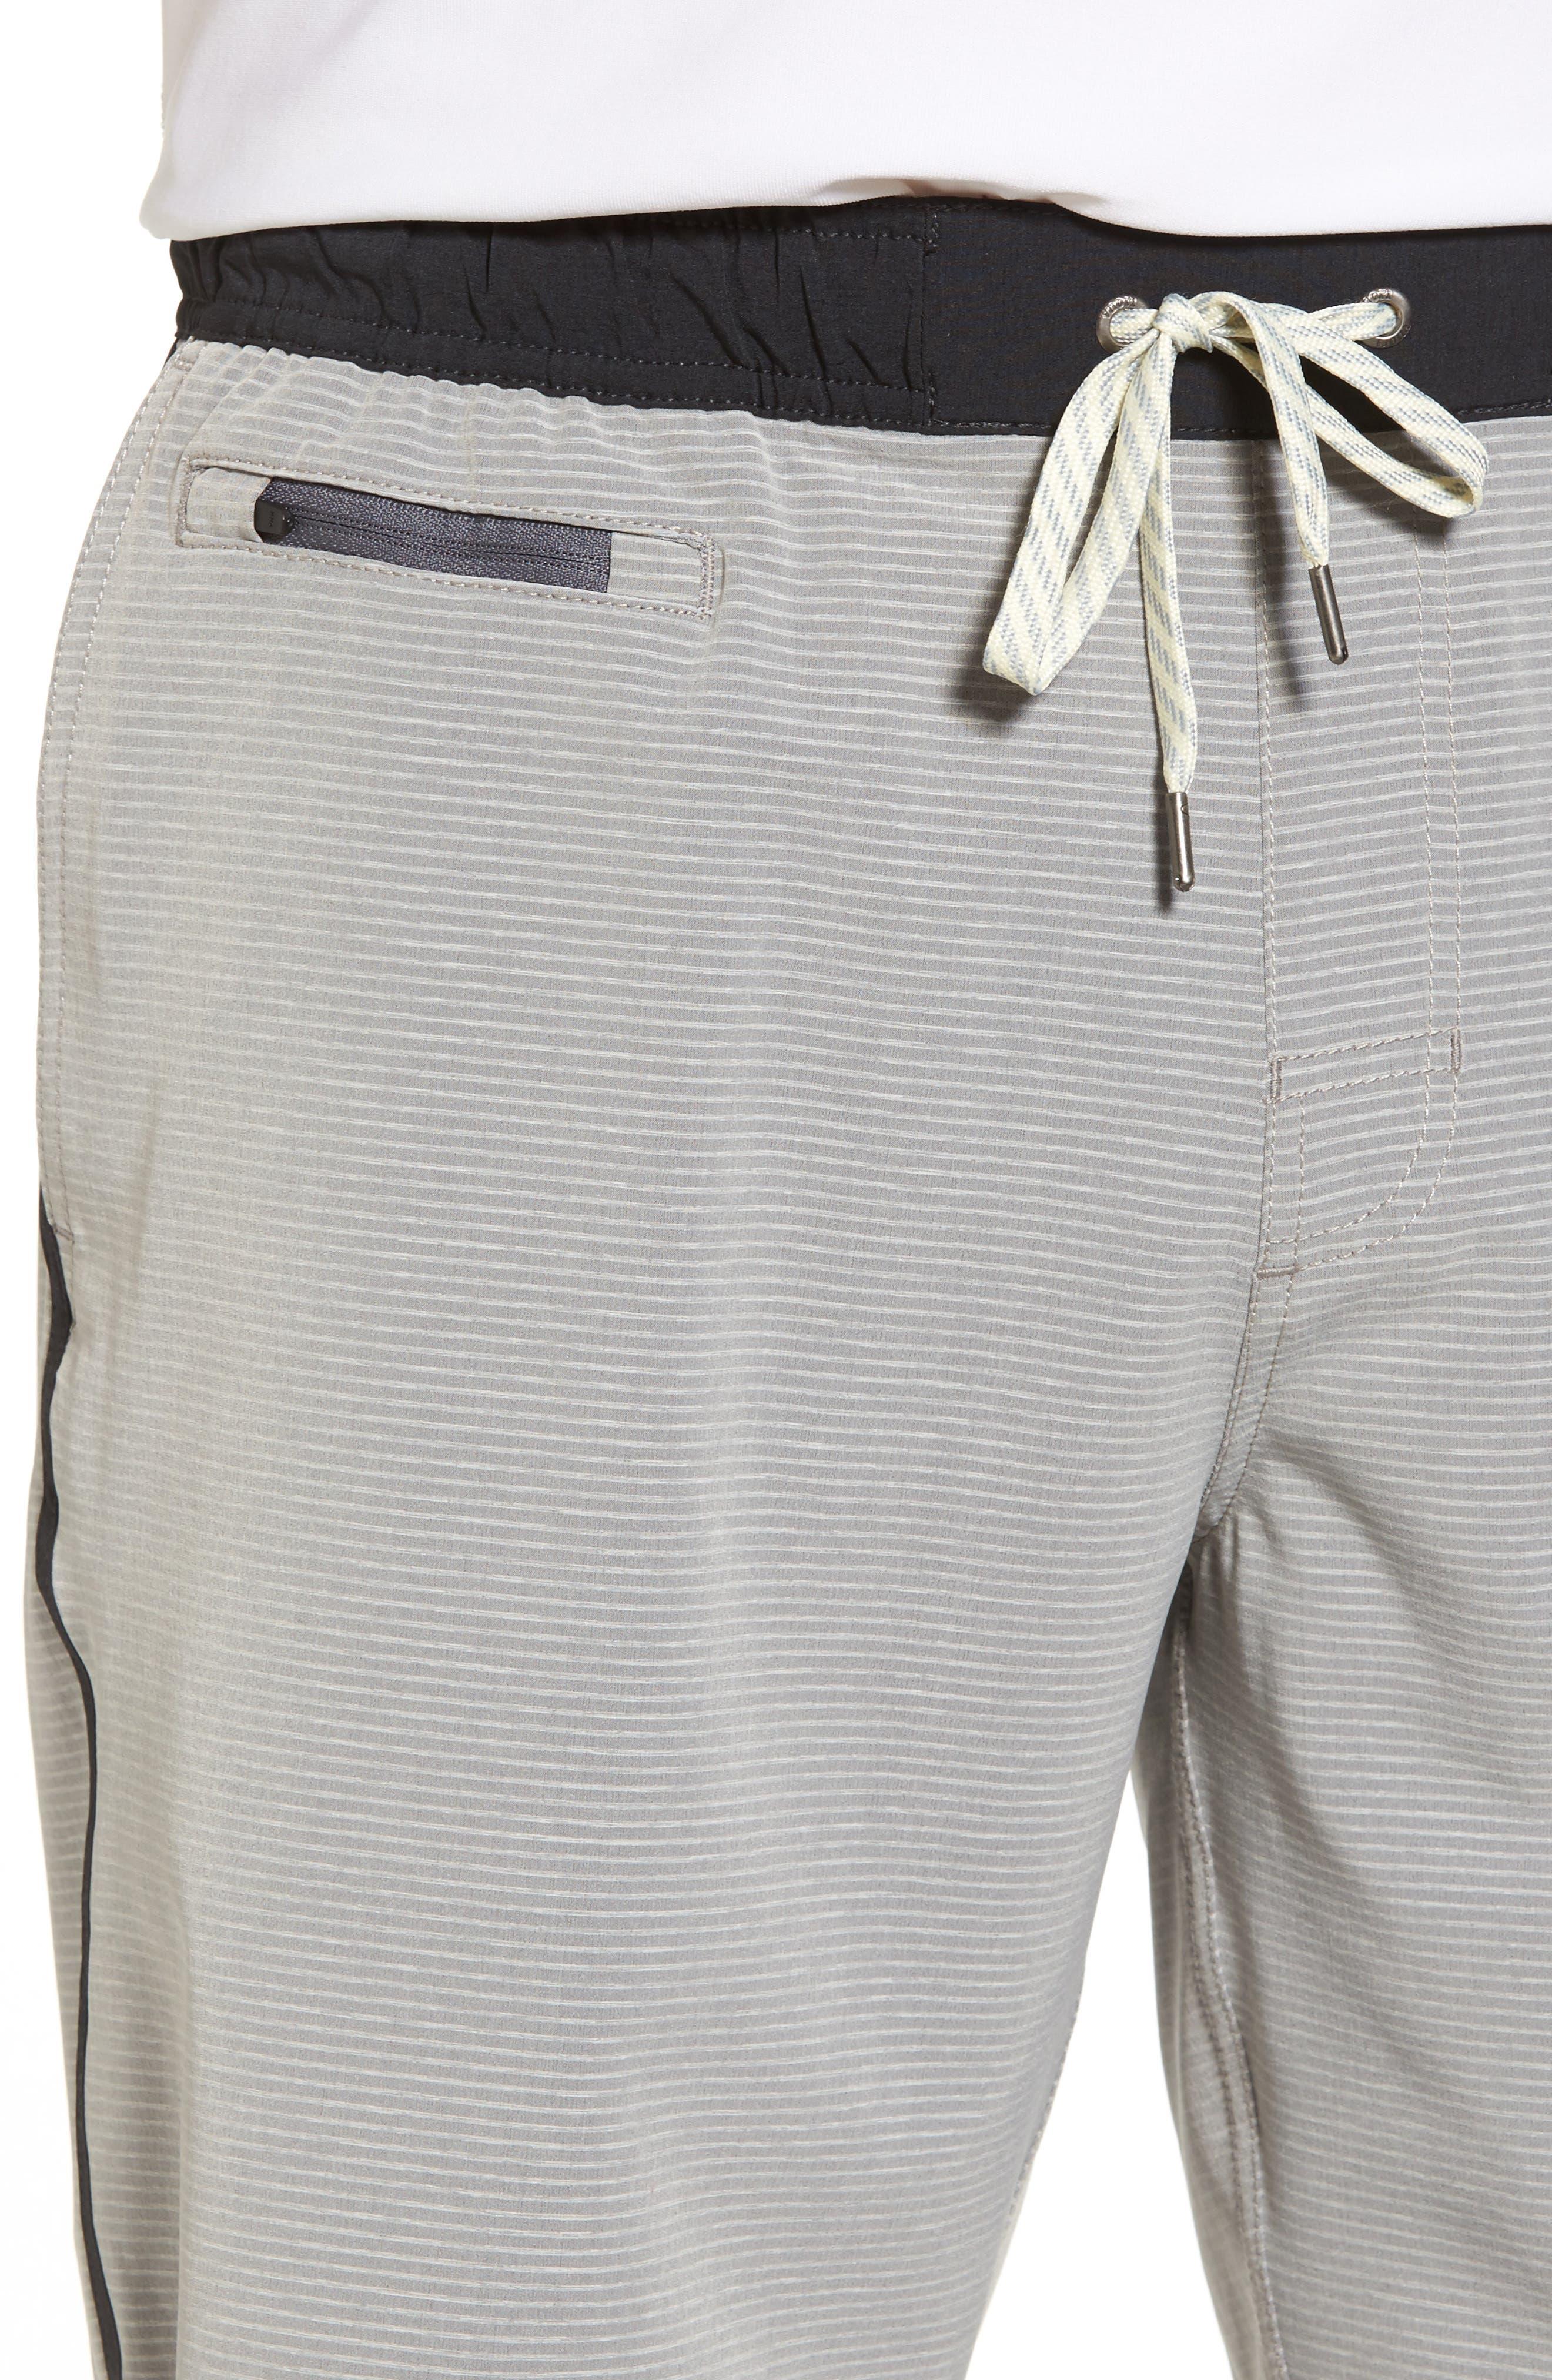 Banks Athletic Shorts,                             Alternate thumbnail 4, color,